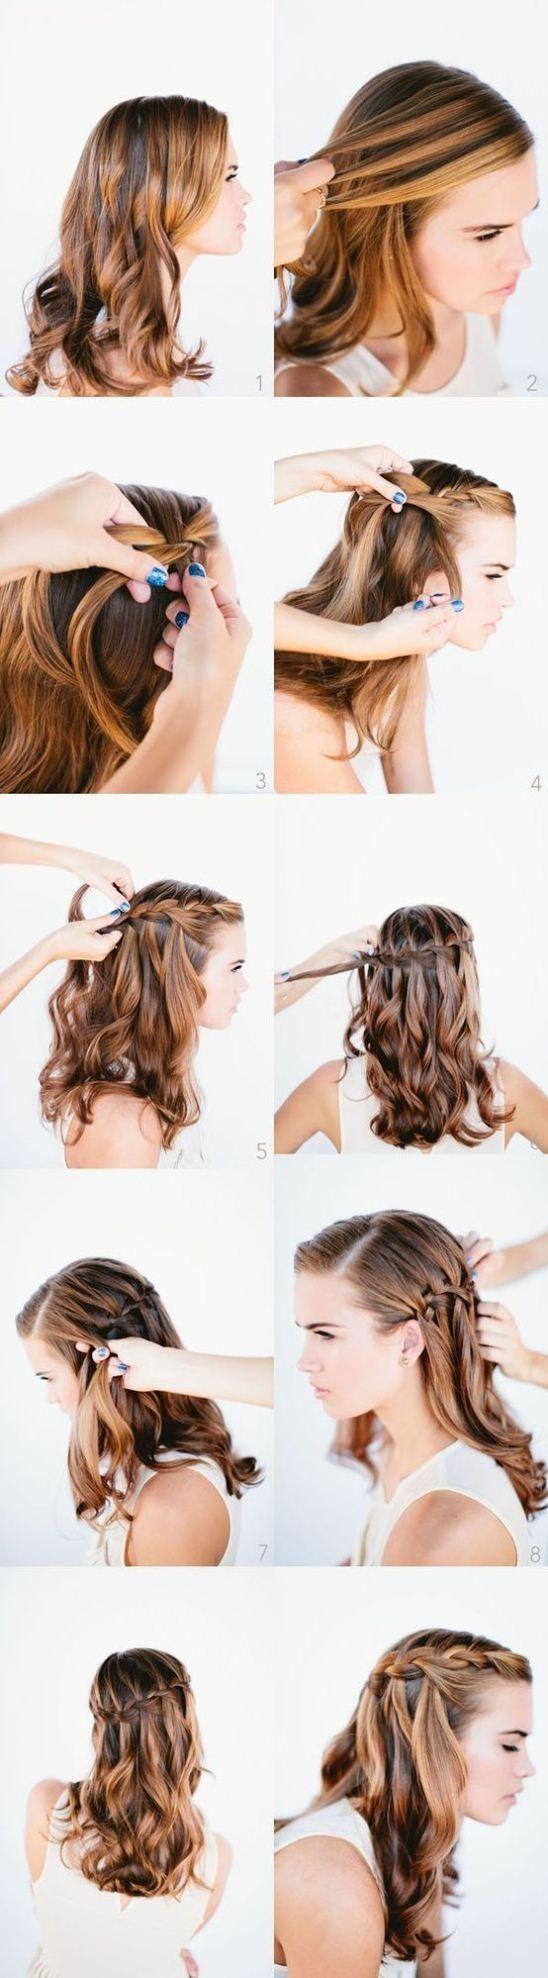 Cute hair stylefor long hair